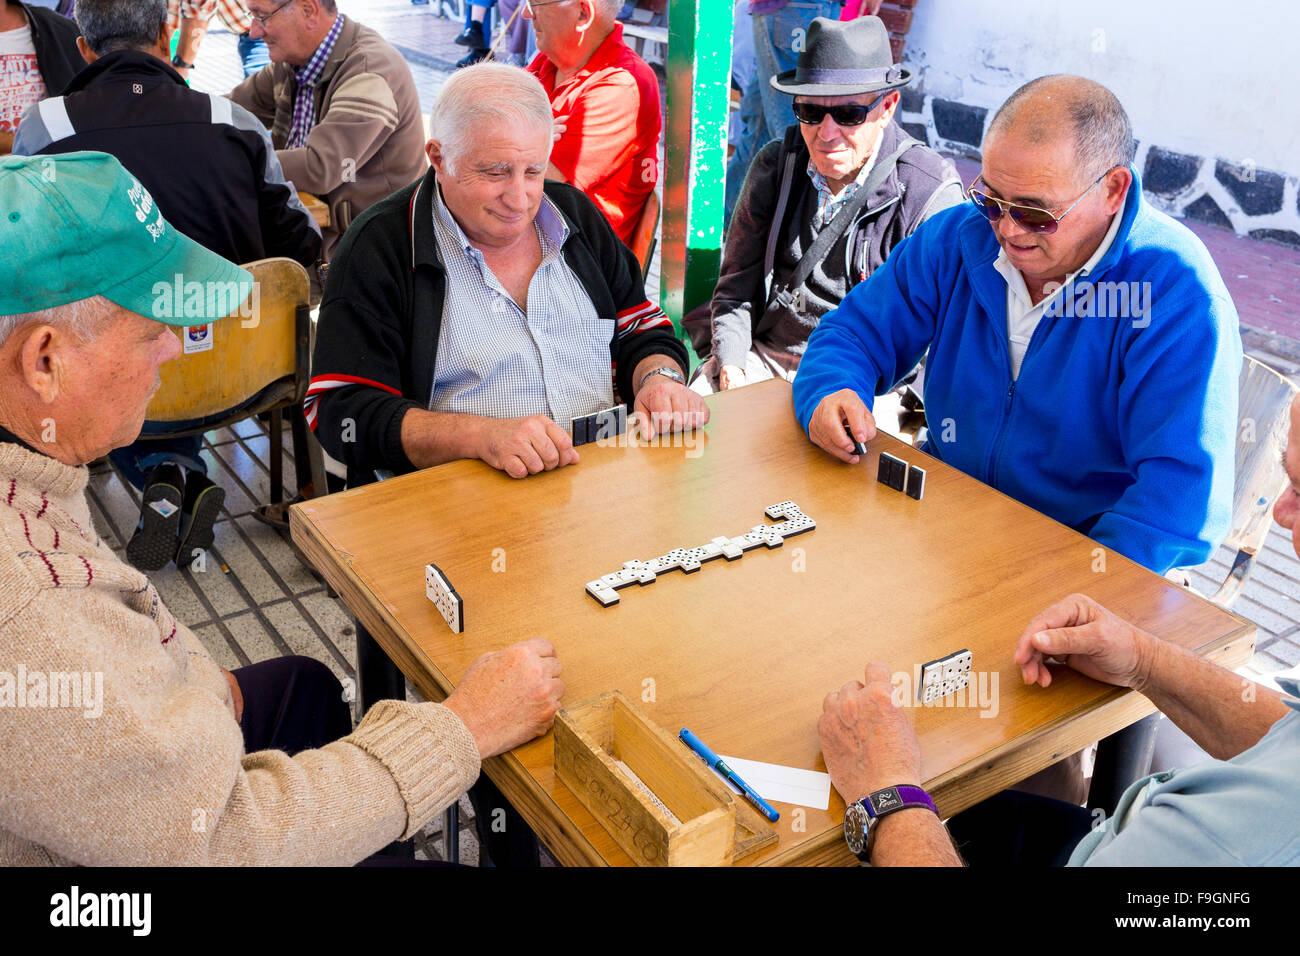 Men playing dominoes, Arrecife, Lanzarote, Canary Islands, Spain - Stock Image